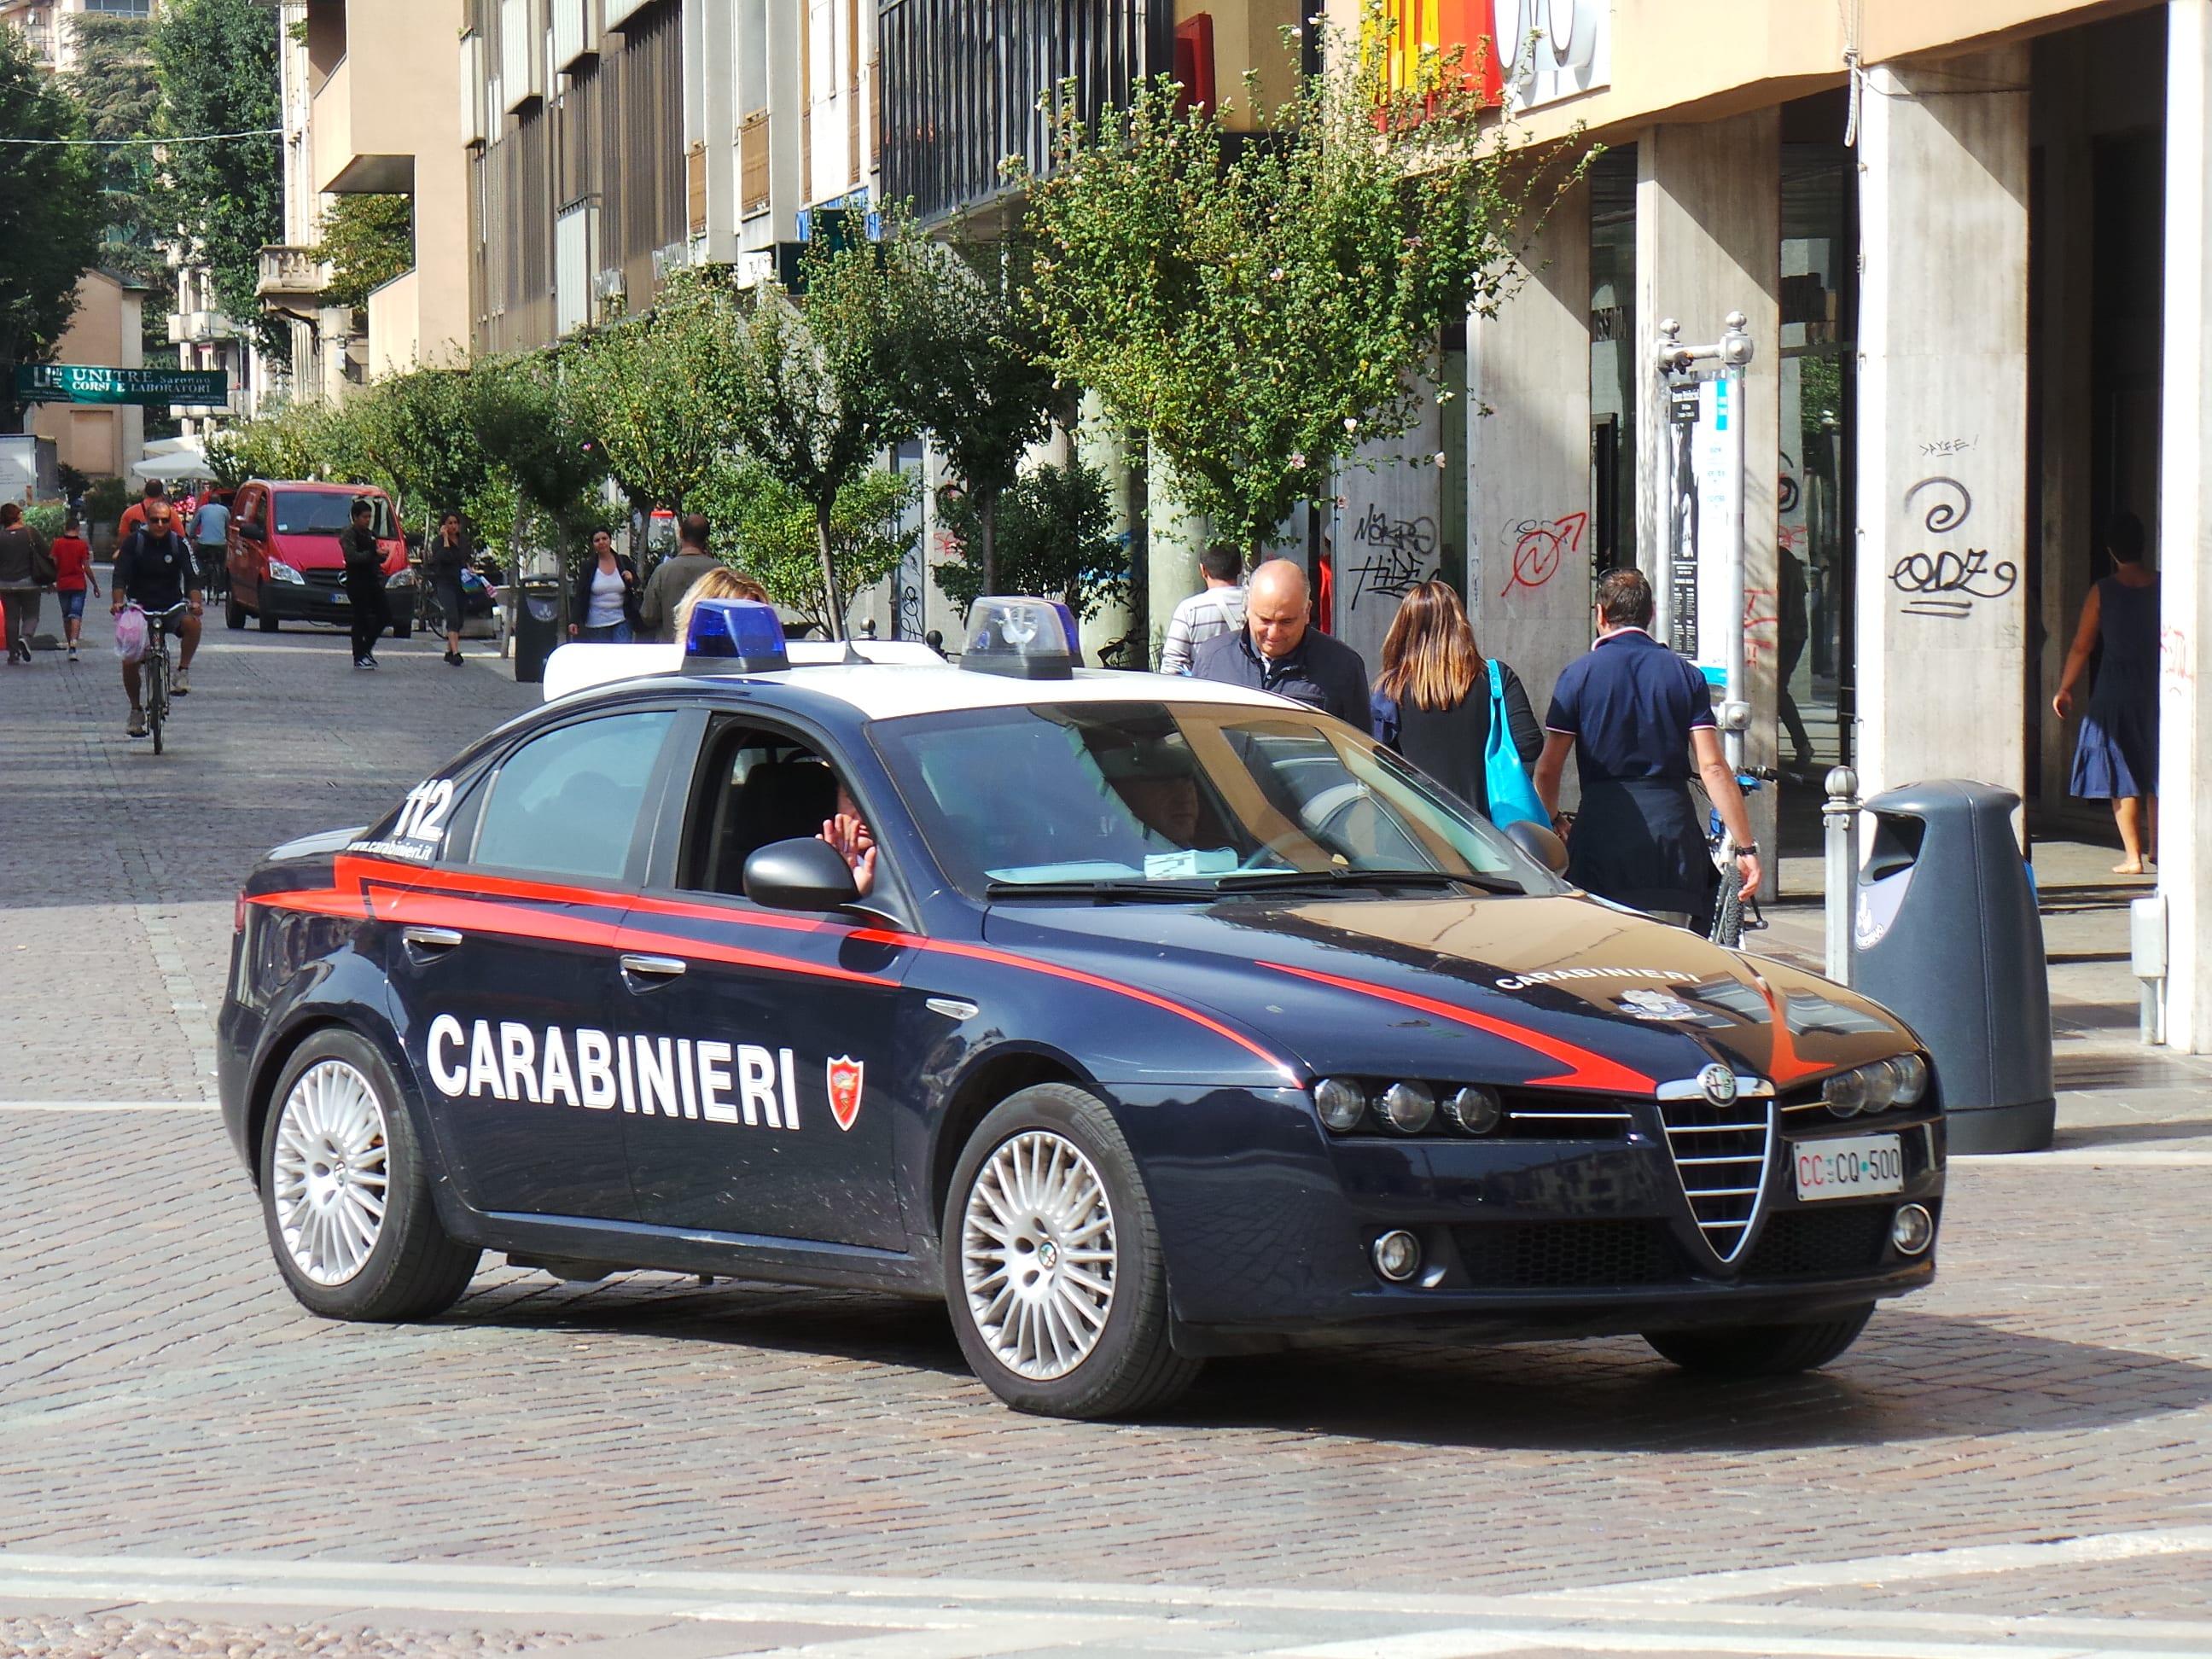 carabinieri corso italia (3)